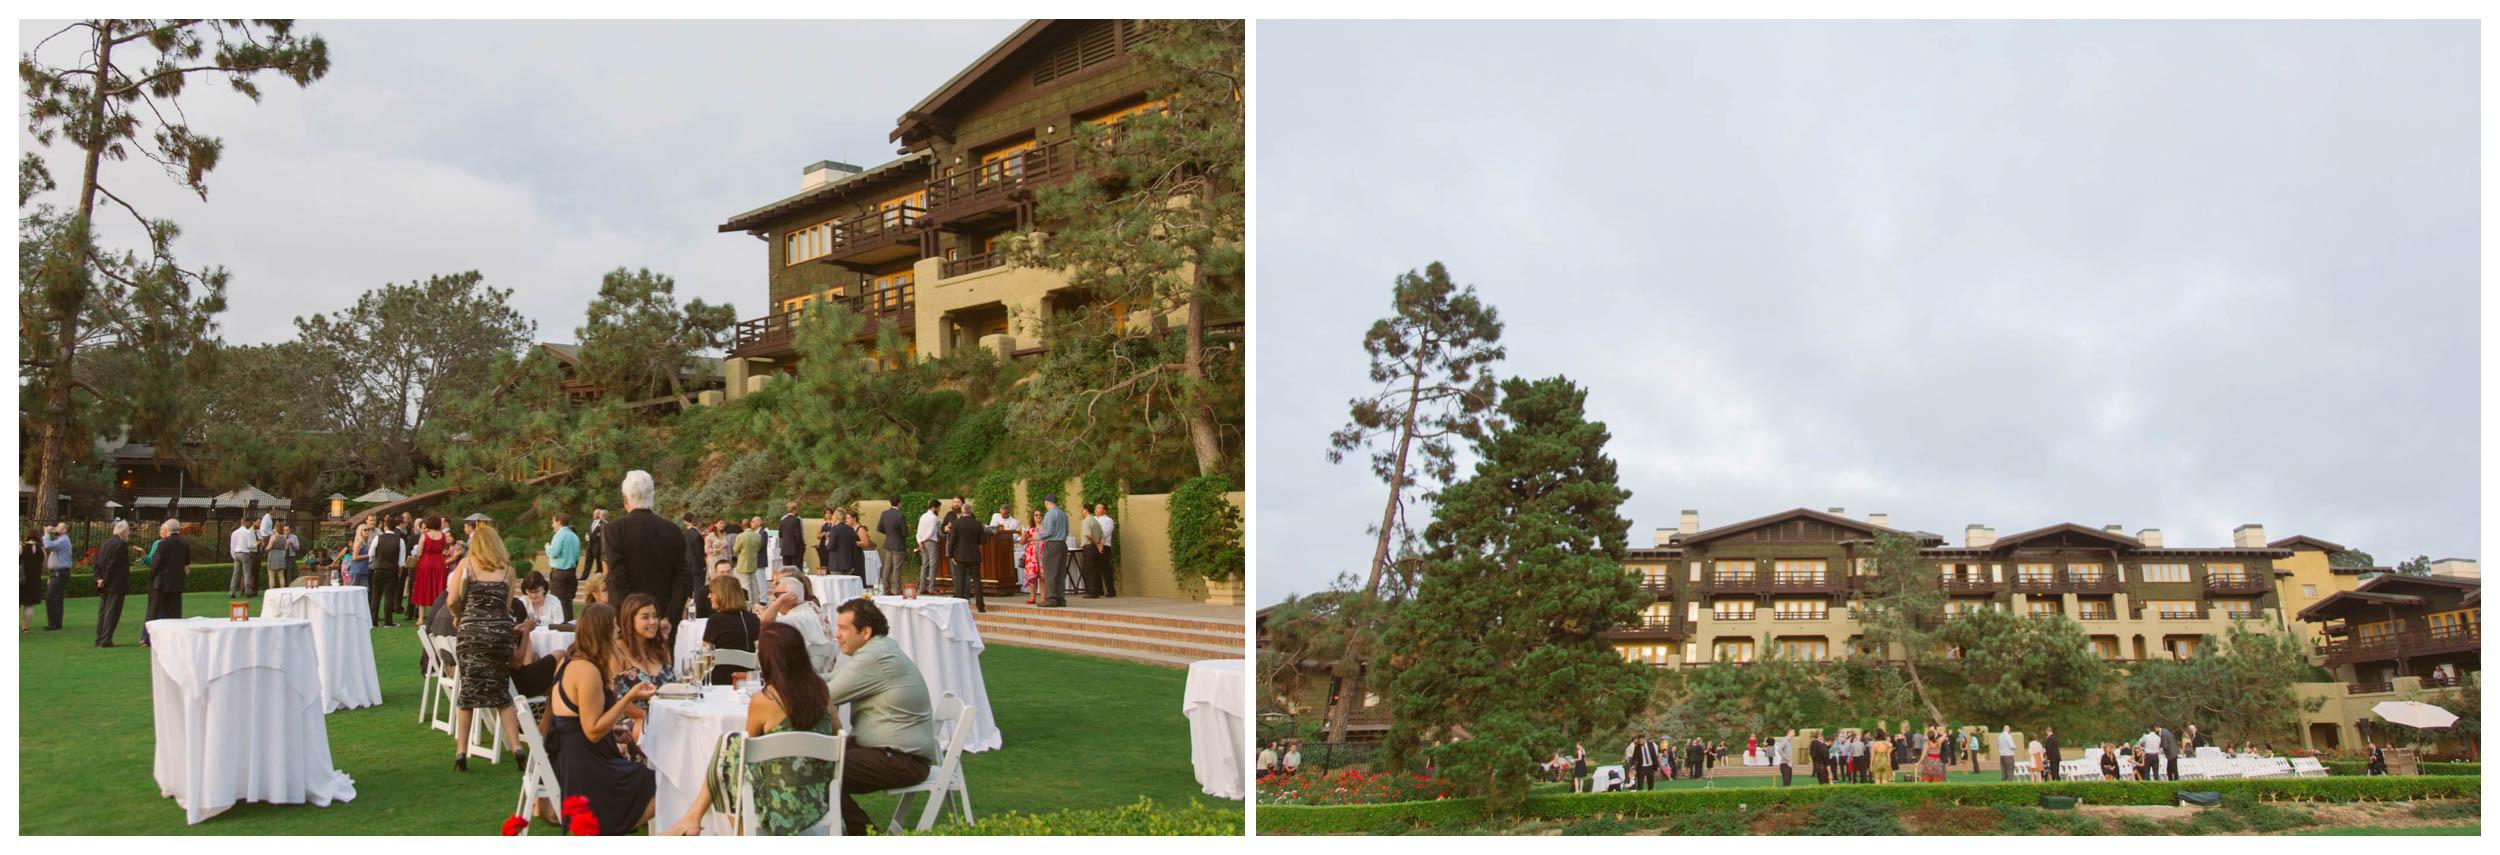 la.jolla.wedding.photography.shewanders-1075.jpg